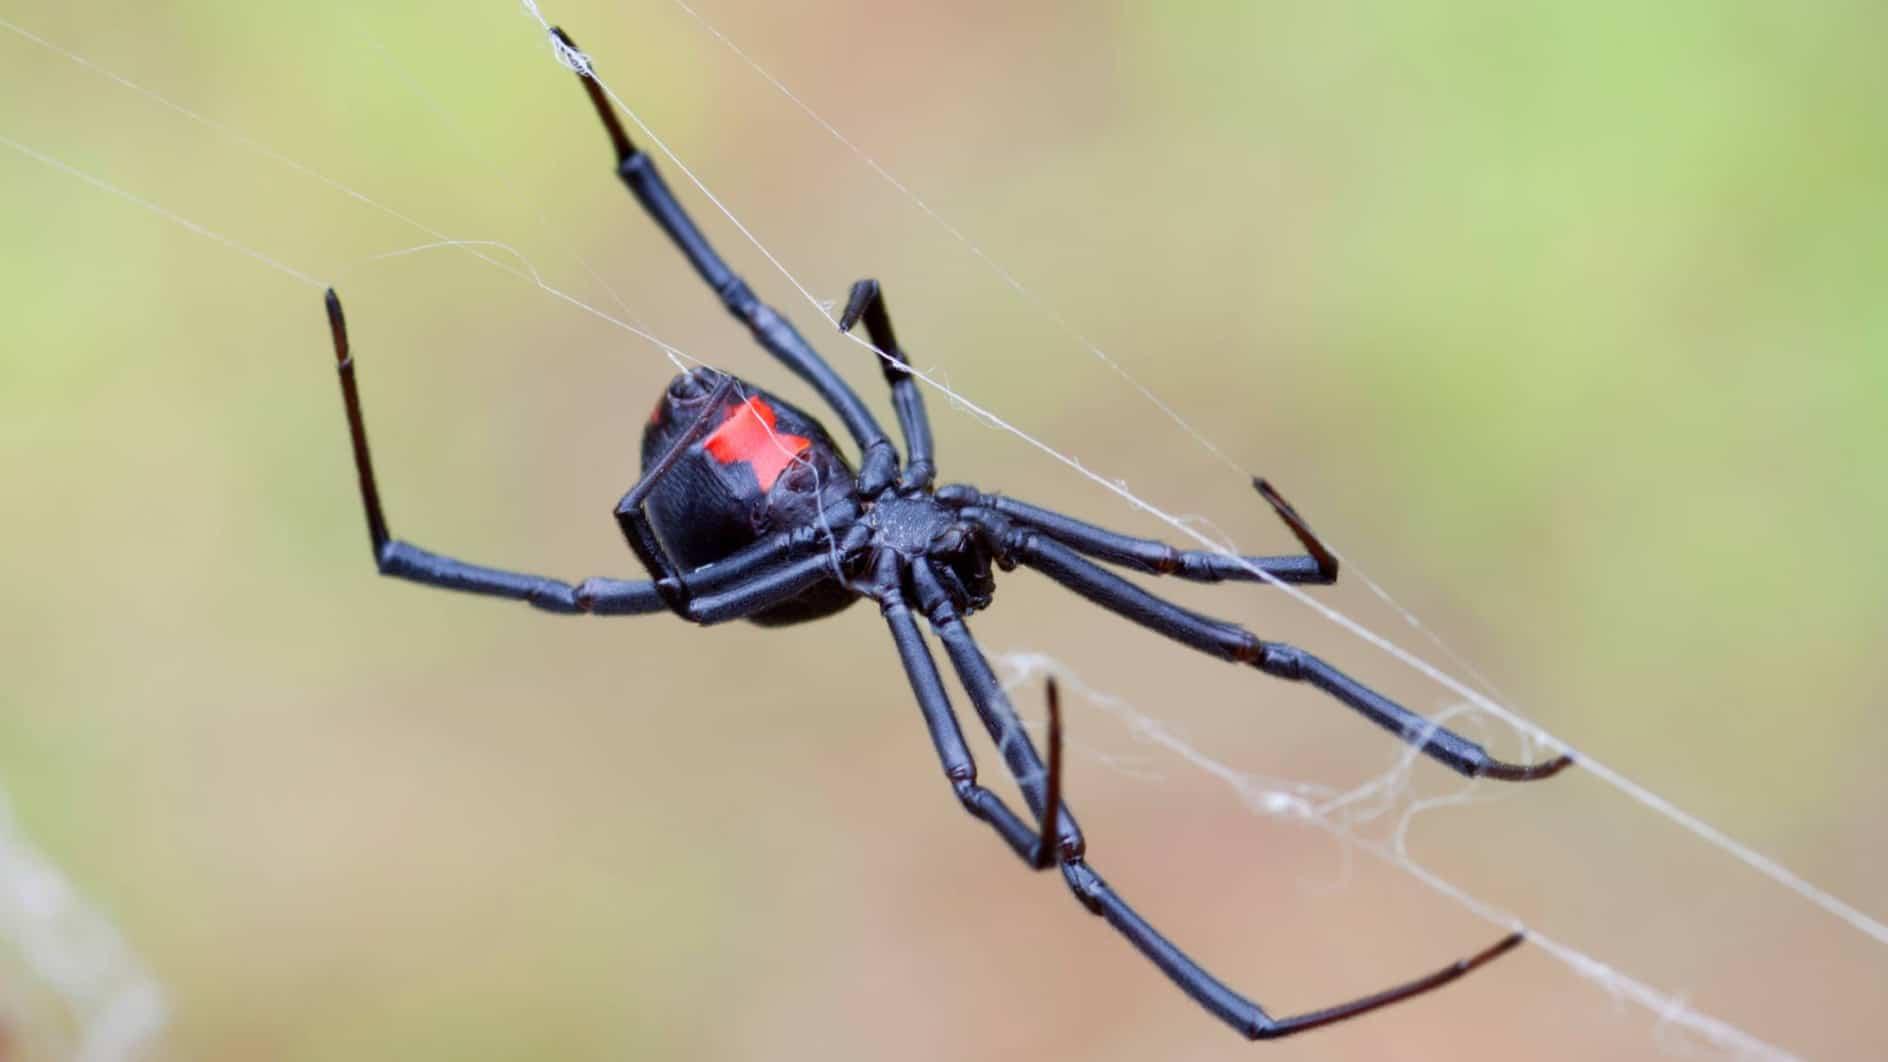 Exterminator Pest Control Spider Bug Free Service Tulsa Oklahoma Black Widow